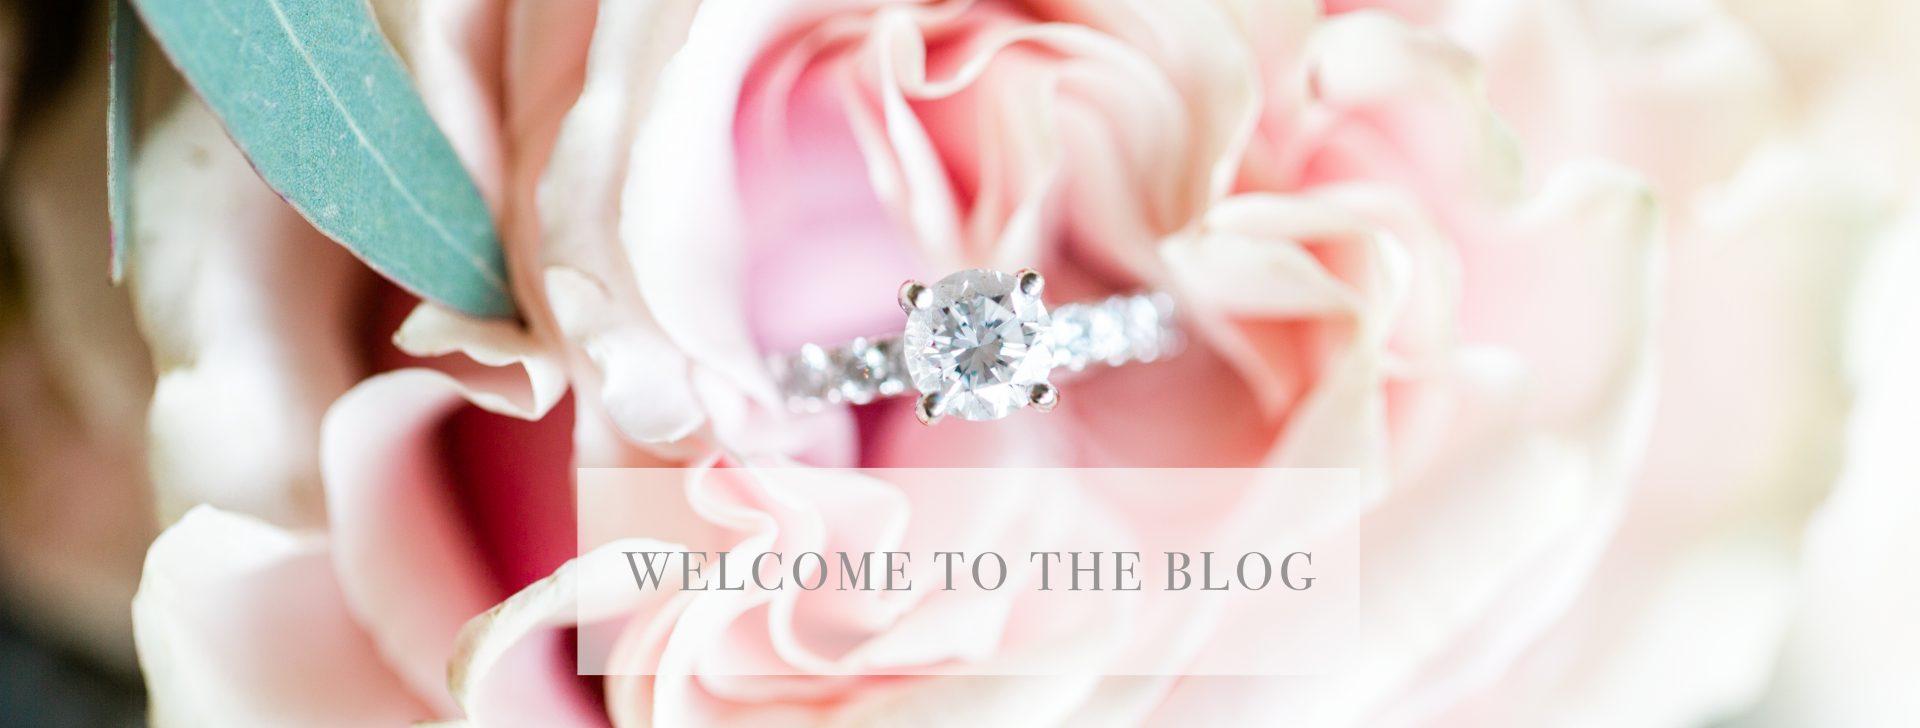 Wedding | Cortese Wedding Photography & Film